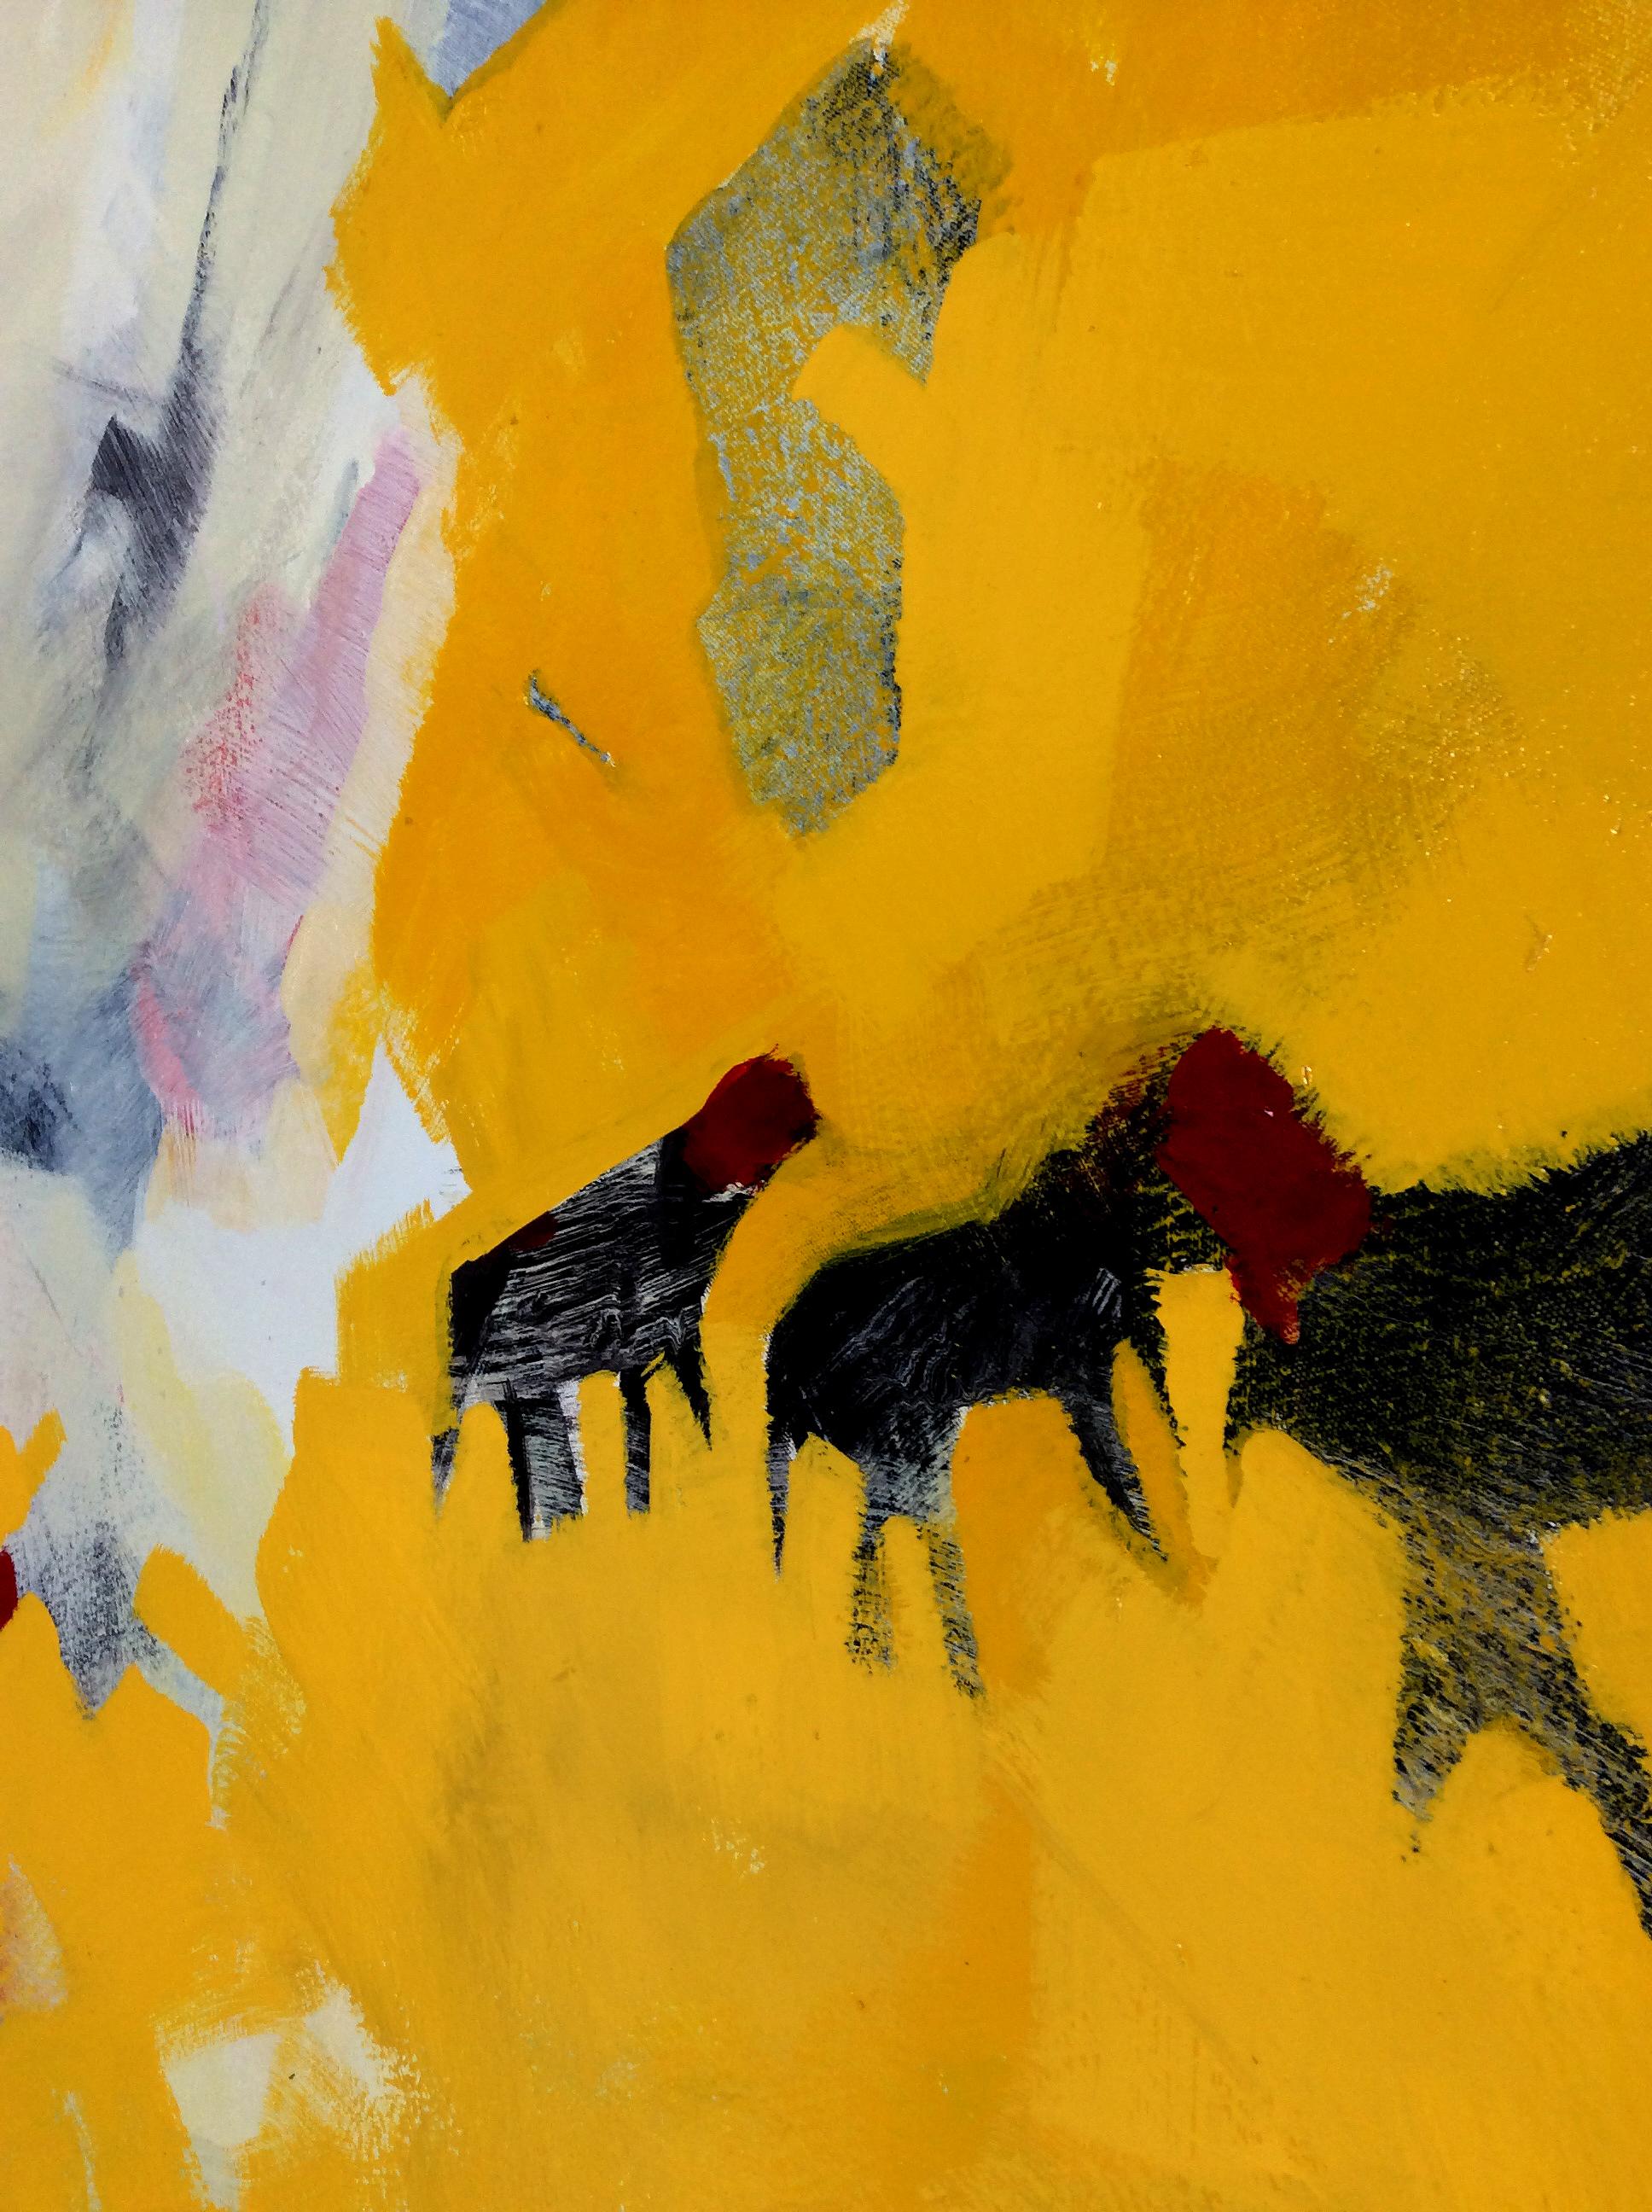 Cows_02.jpg